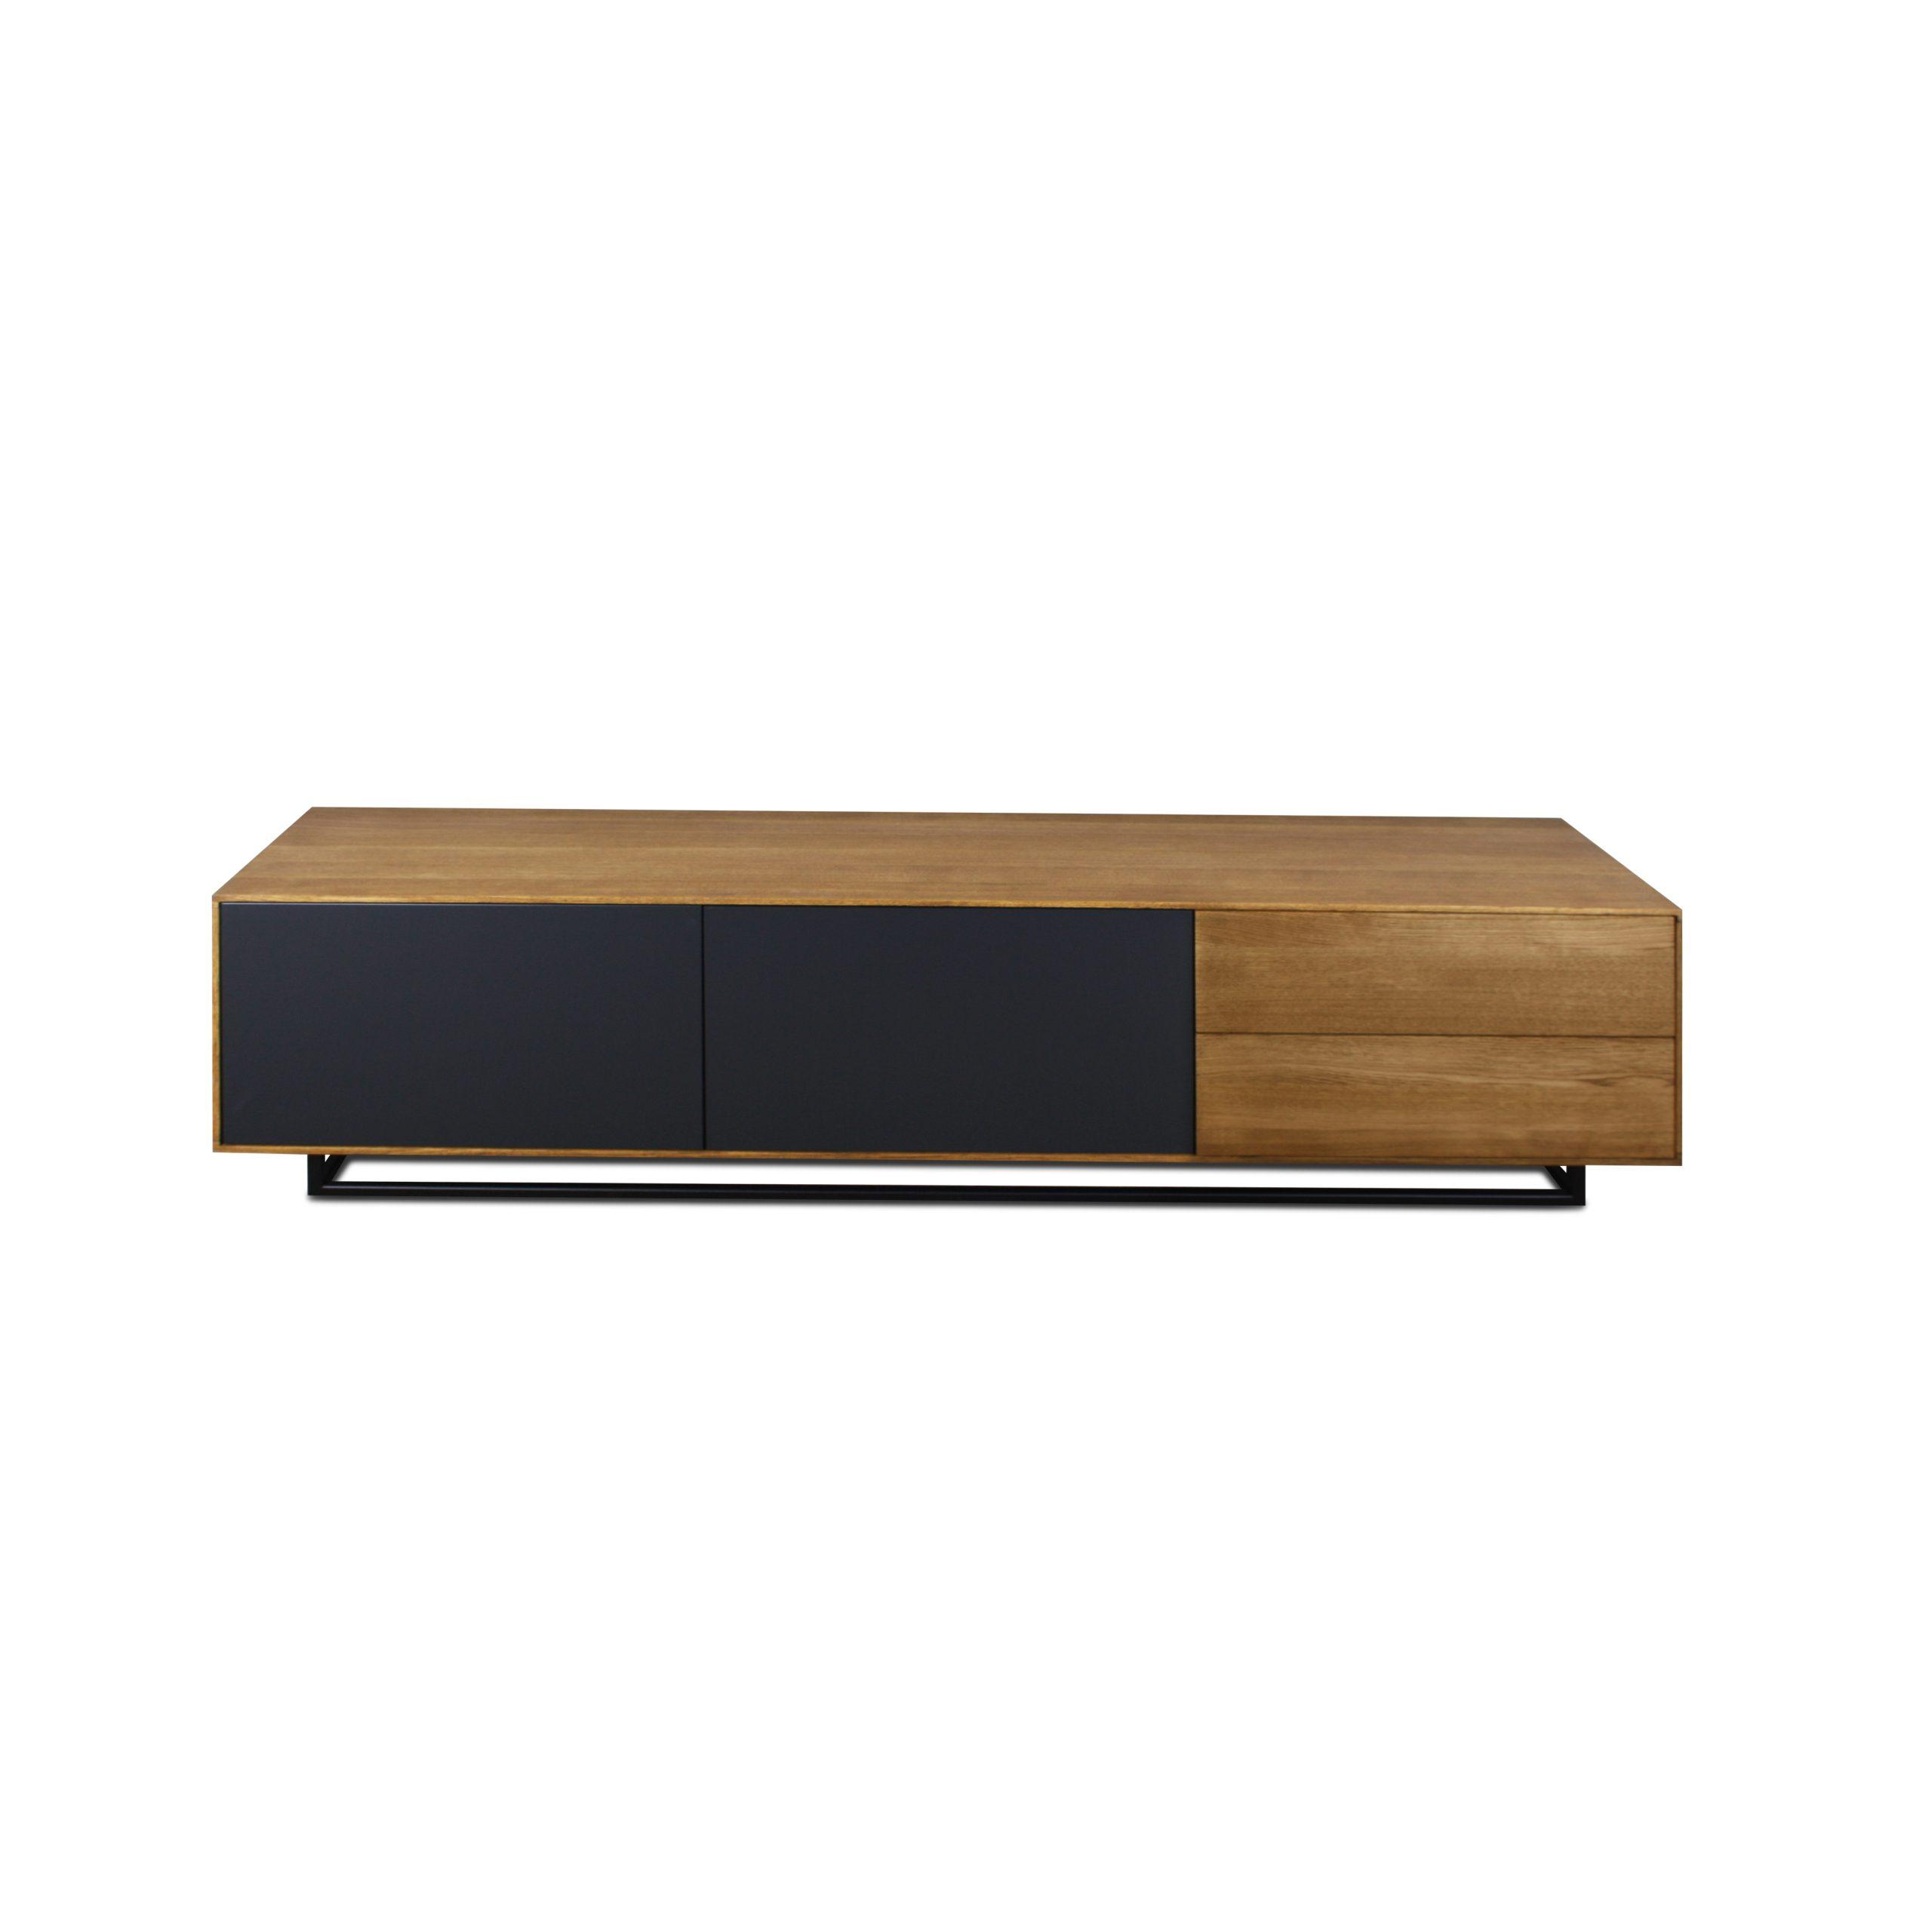 Juga-furniture-baldu-gamyba-vilniuje-tv-spintele-VILI-produktas-2